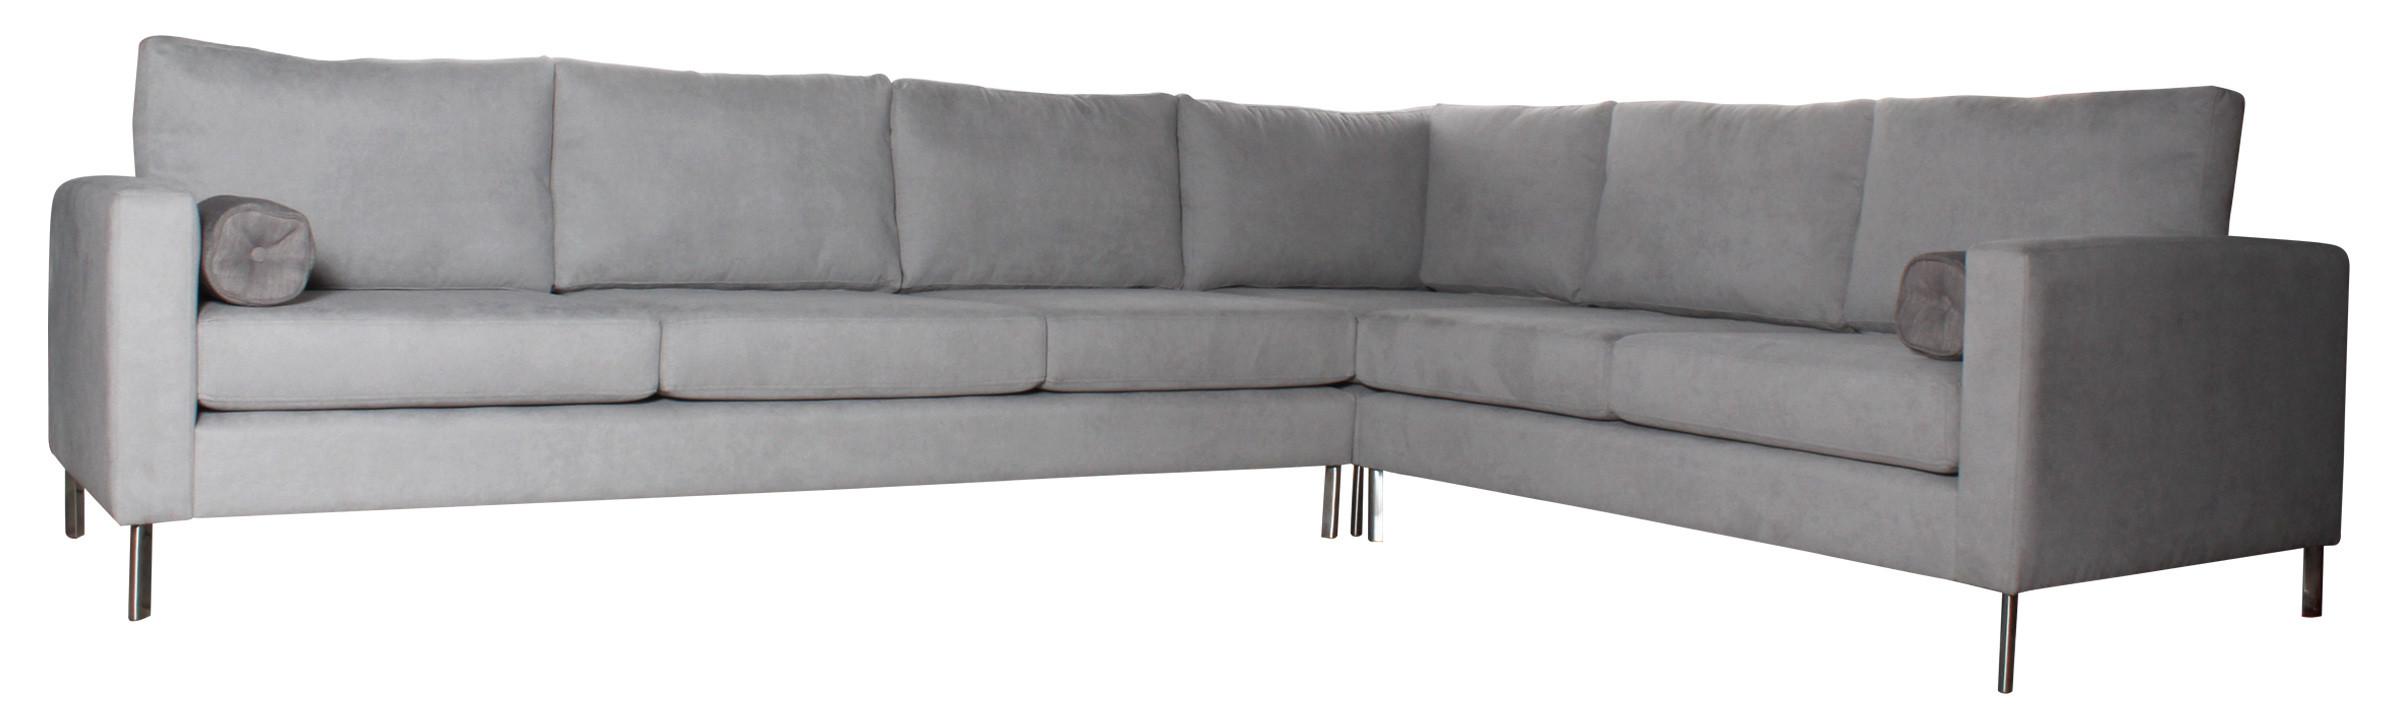 Sofa Modular Dresde Perla Cort2